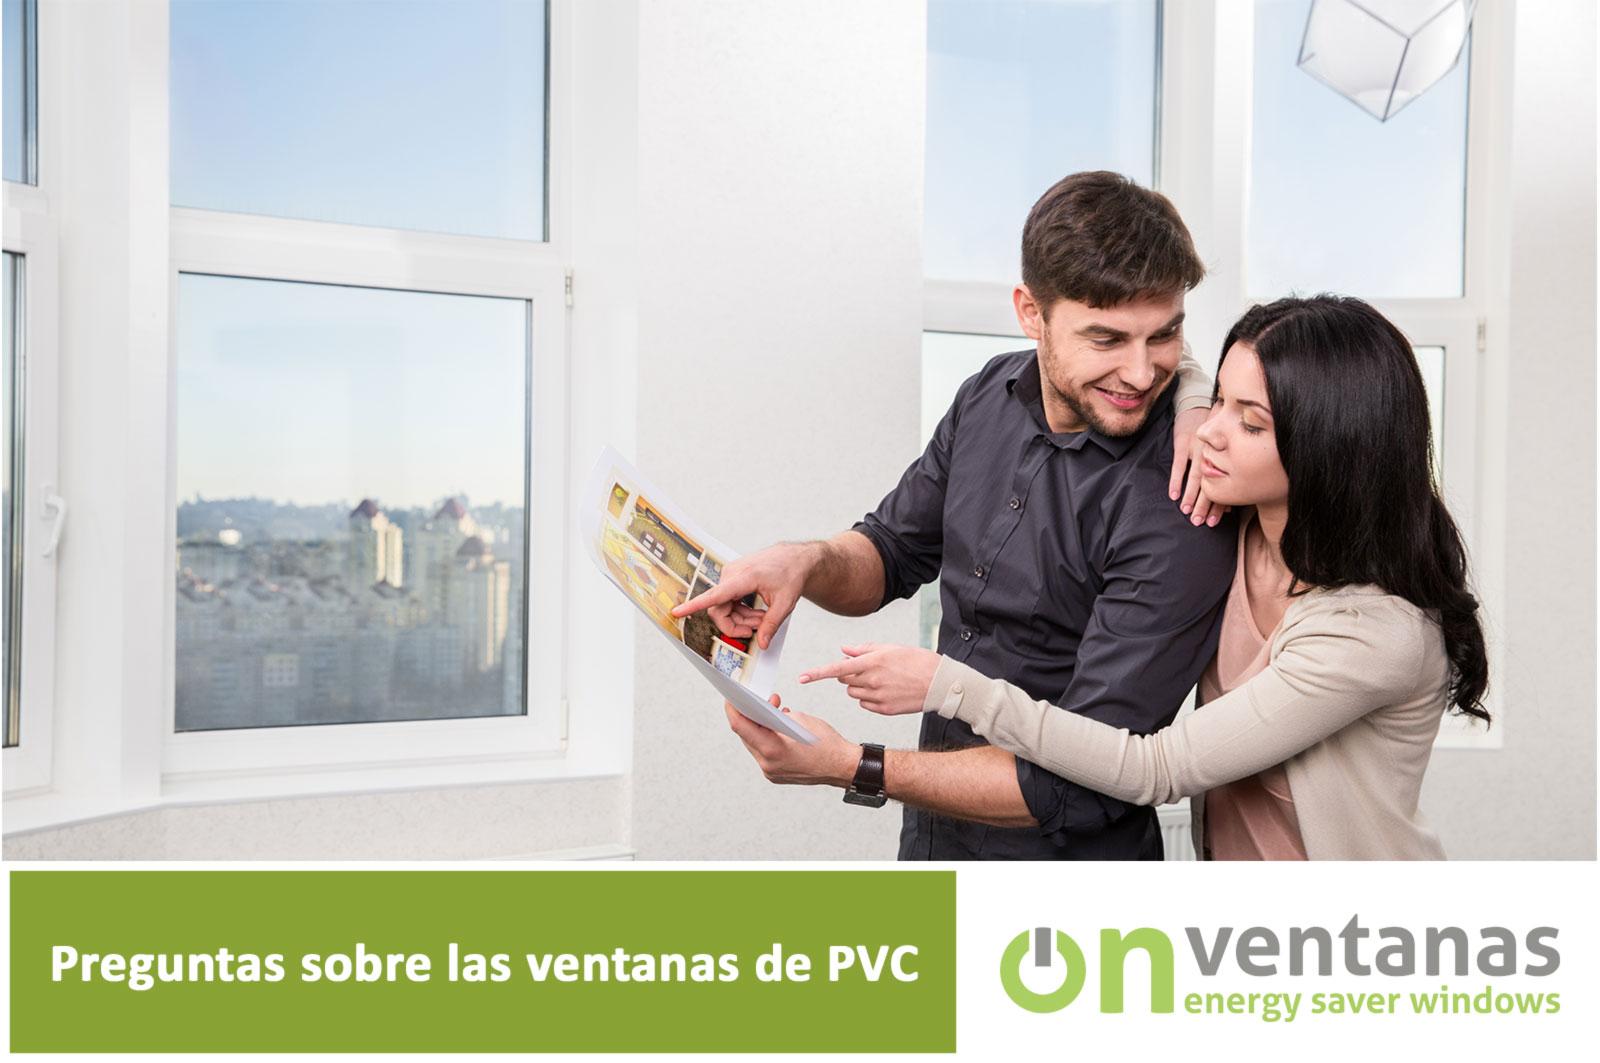 Preguntas ventanas pvc